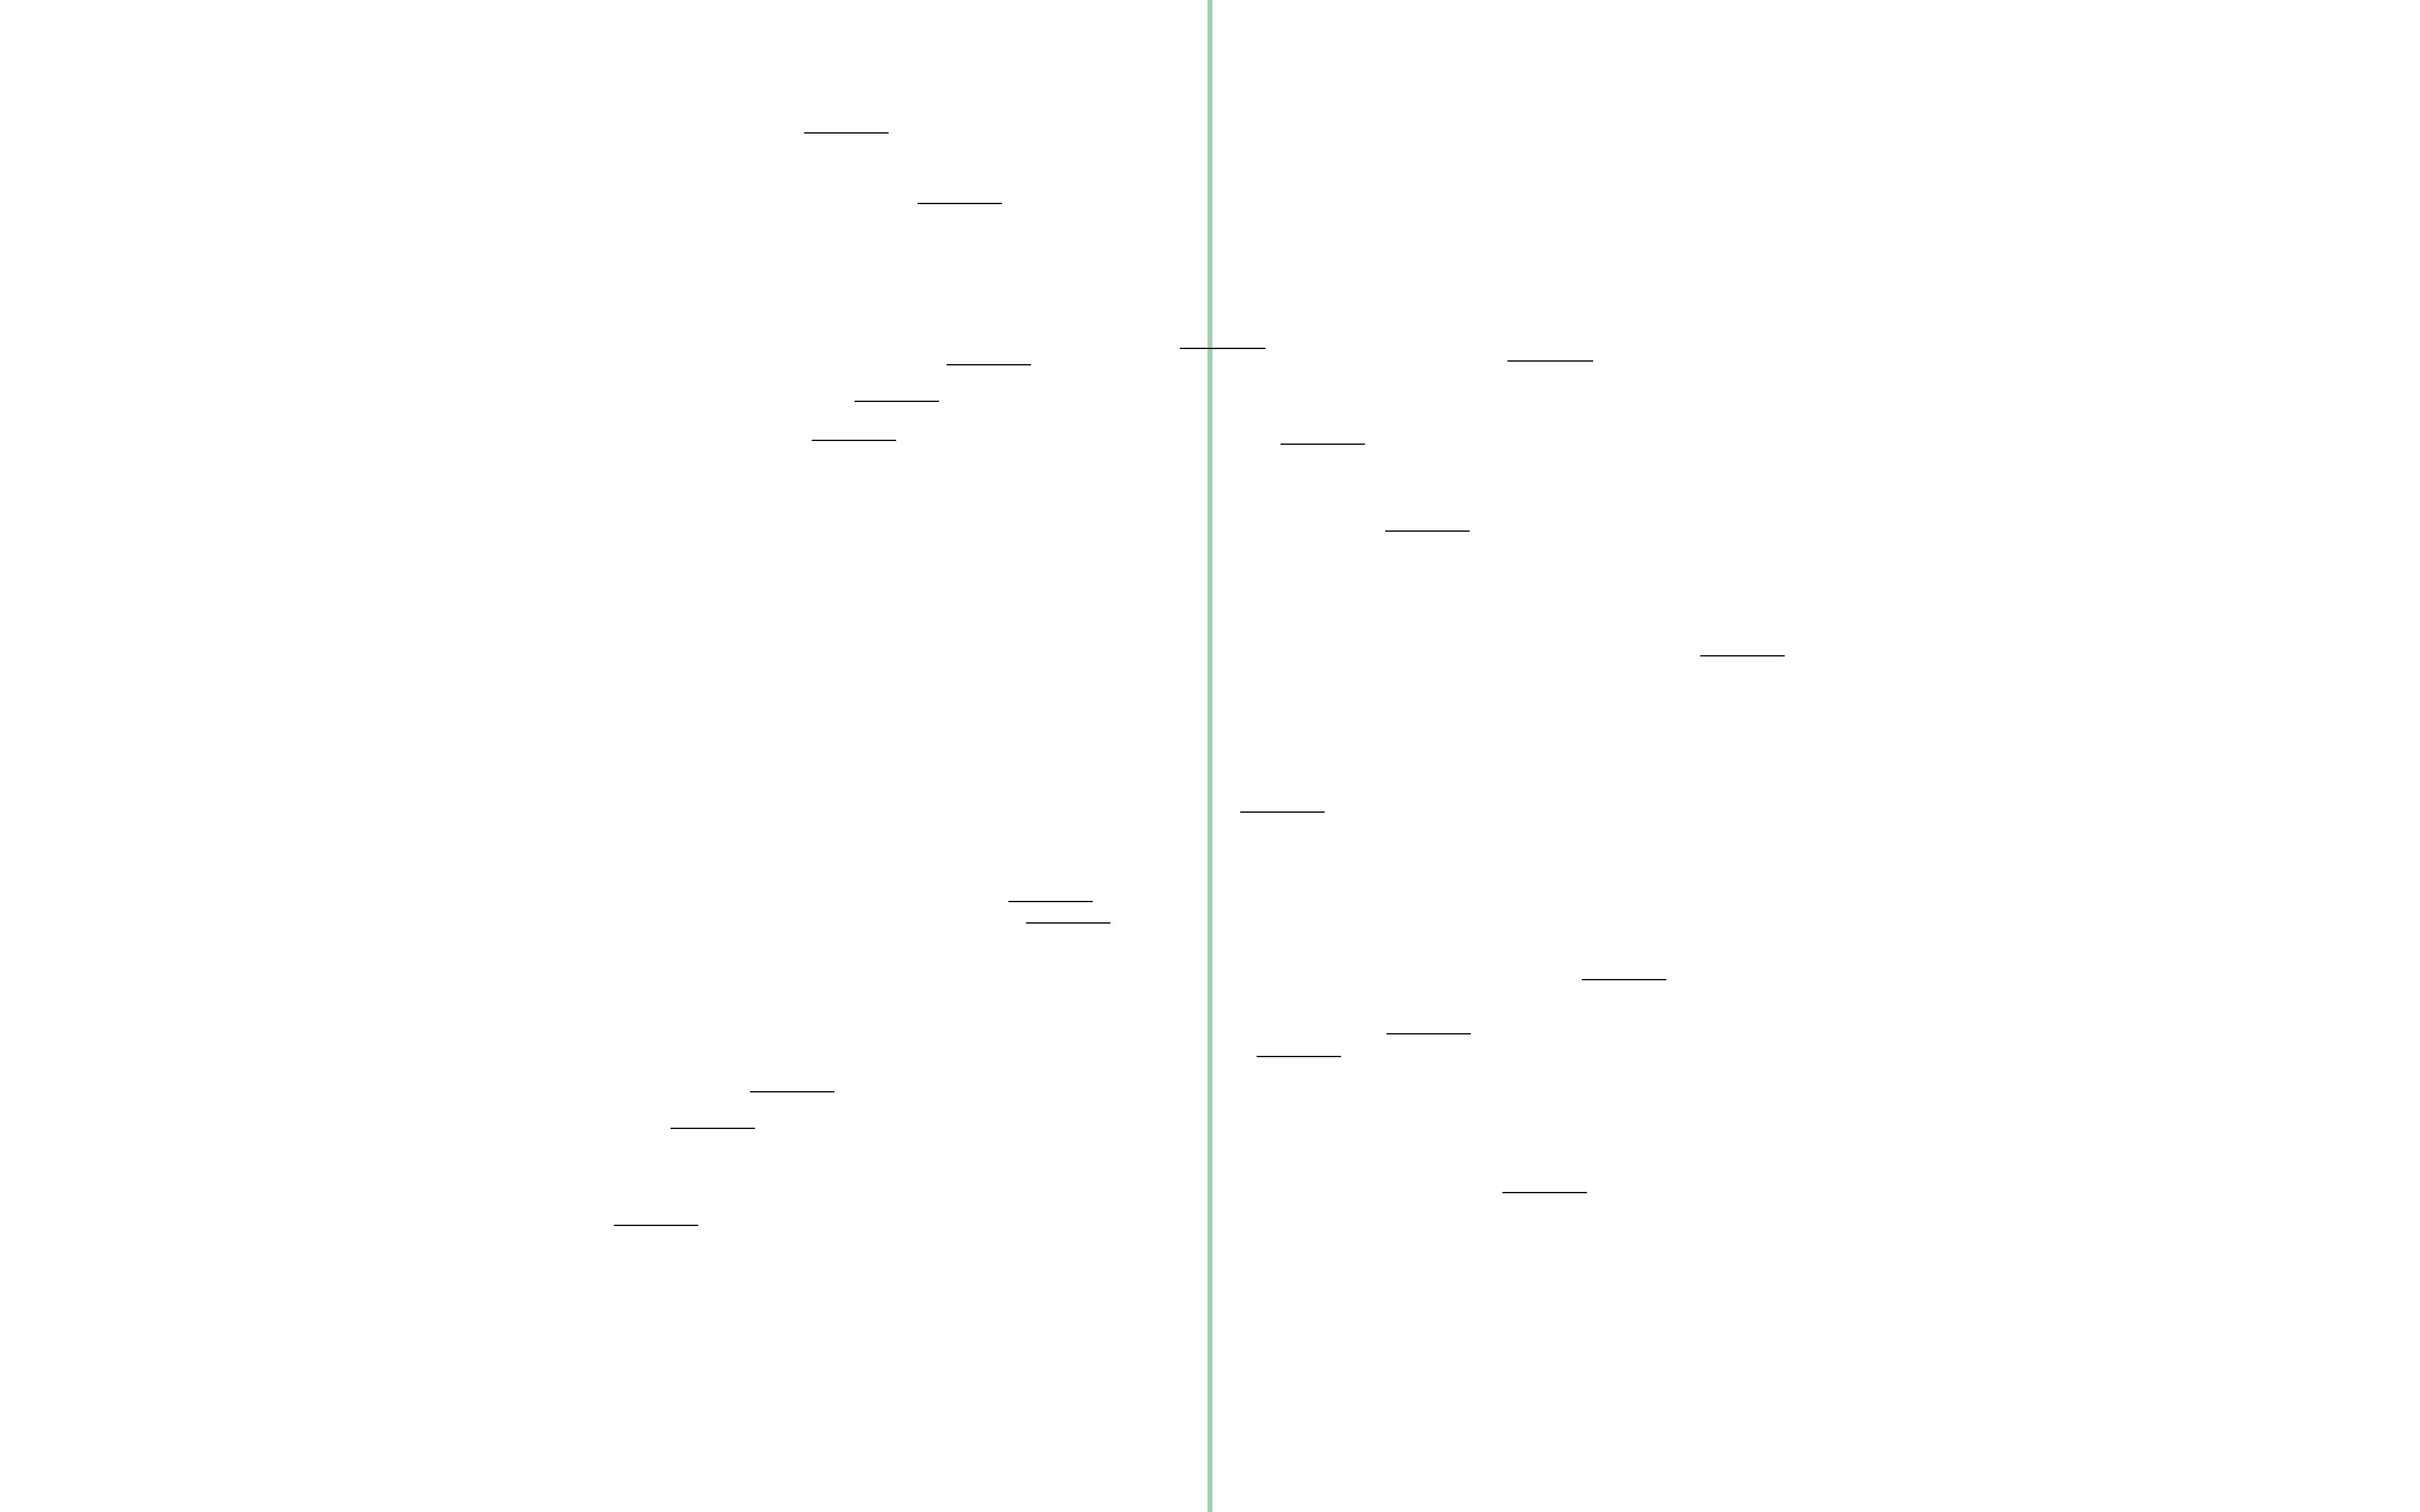 FAE-Random-1.0-021